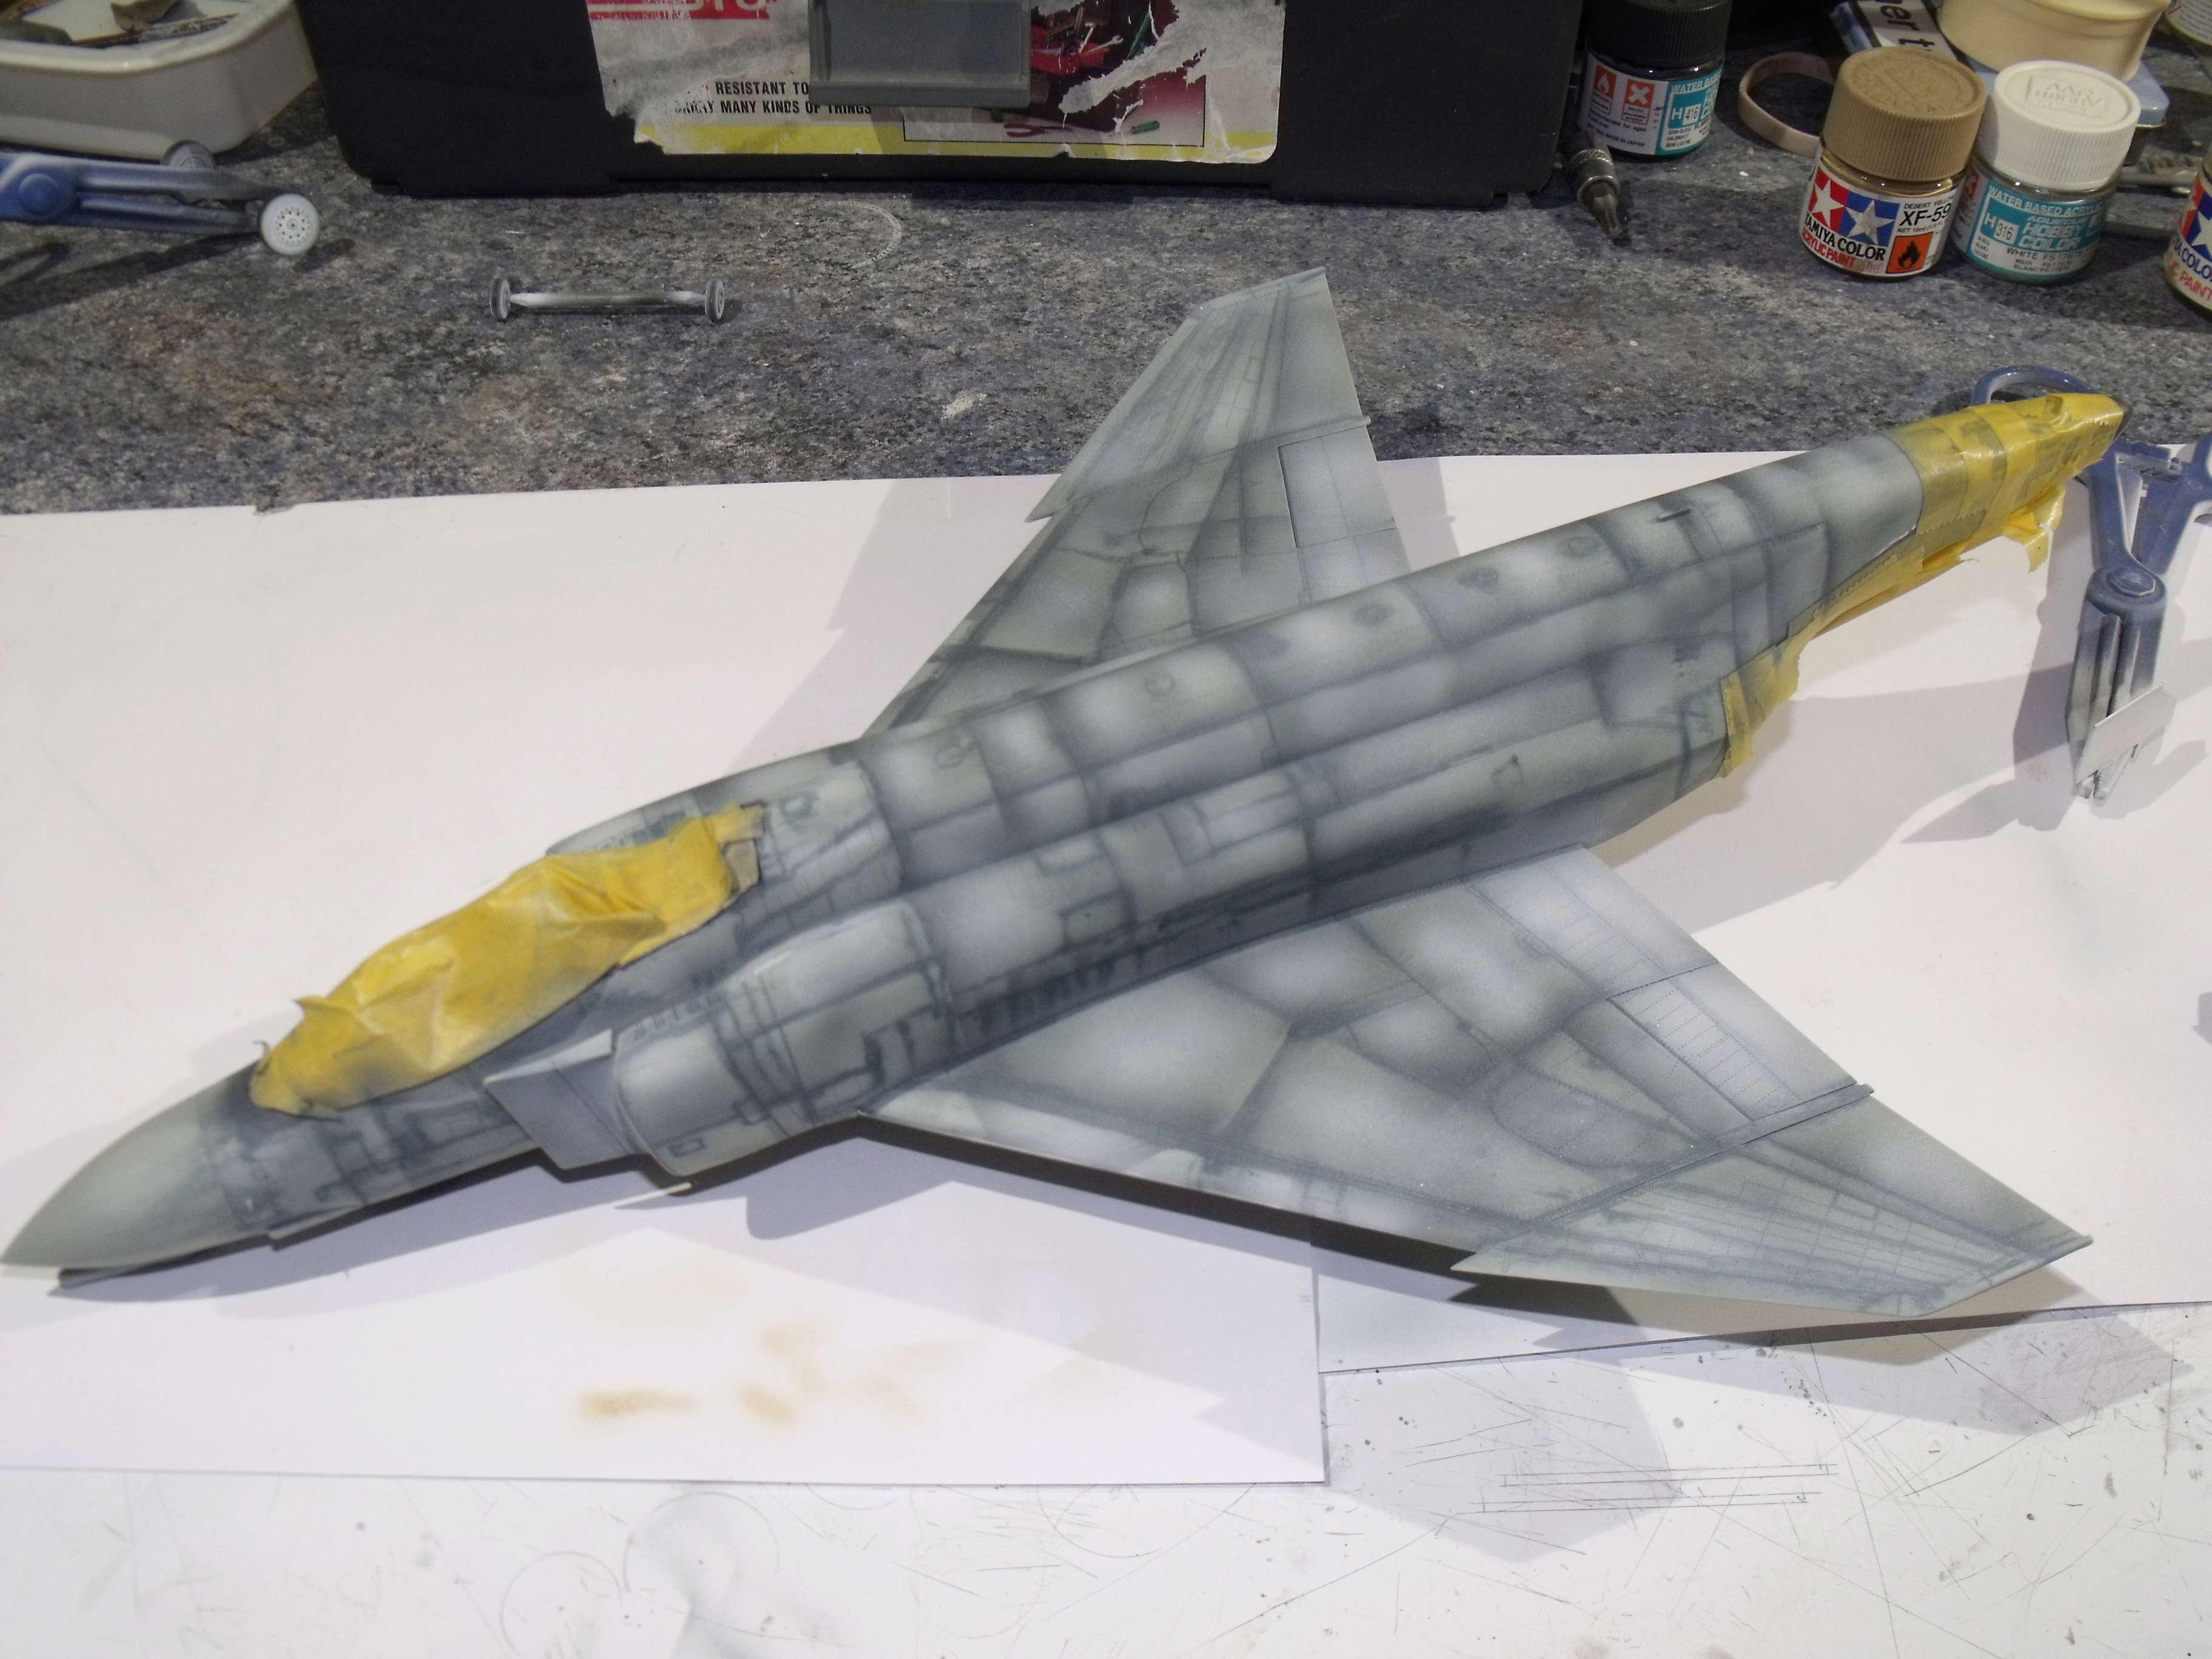 F-4 B Phantom 1/48° - VF-51 - 1972 - Début de patine. - Page 4 Dscf7037